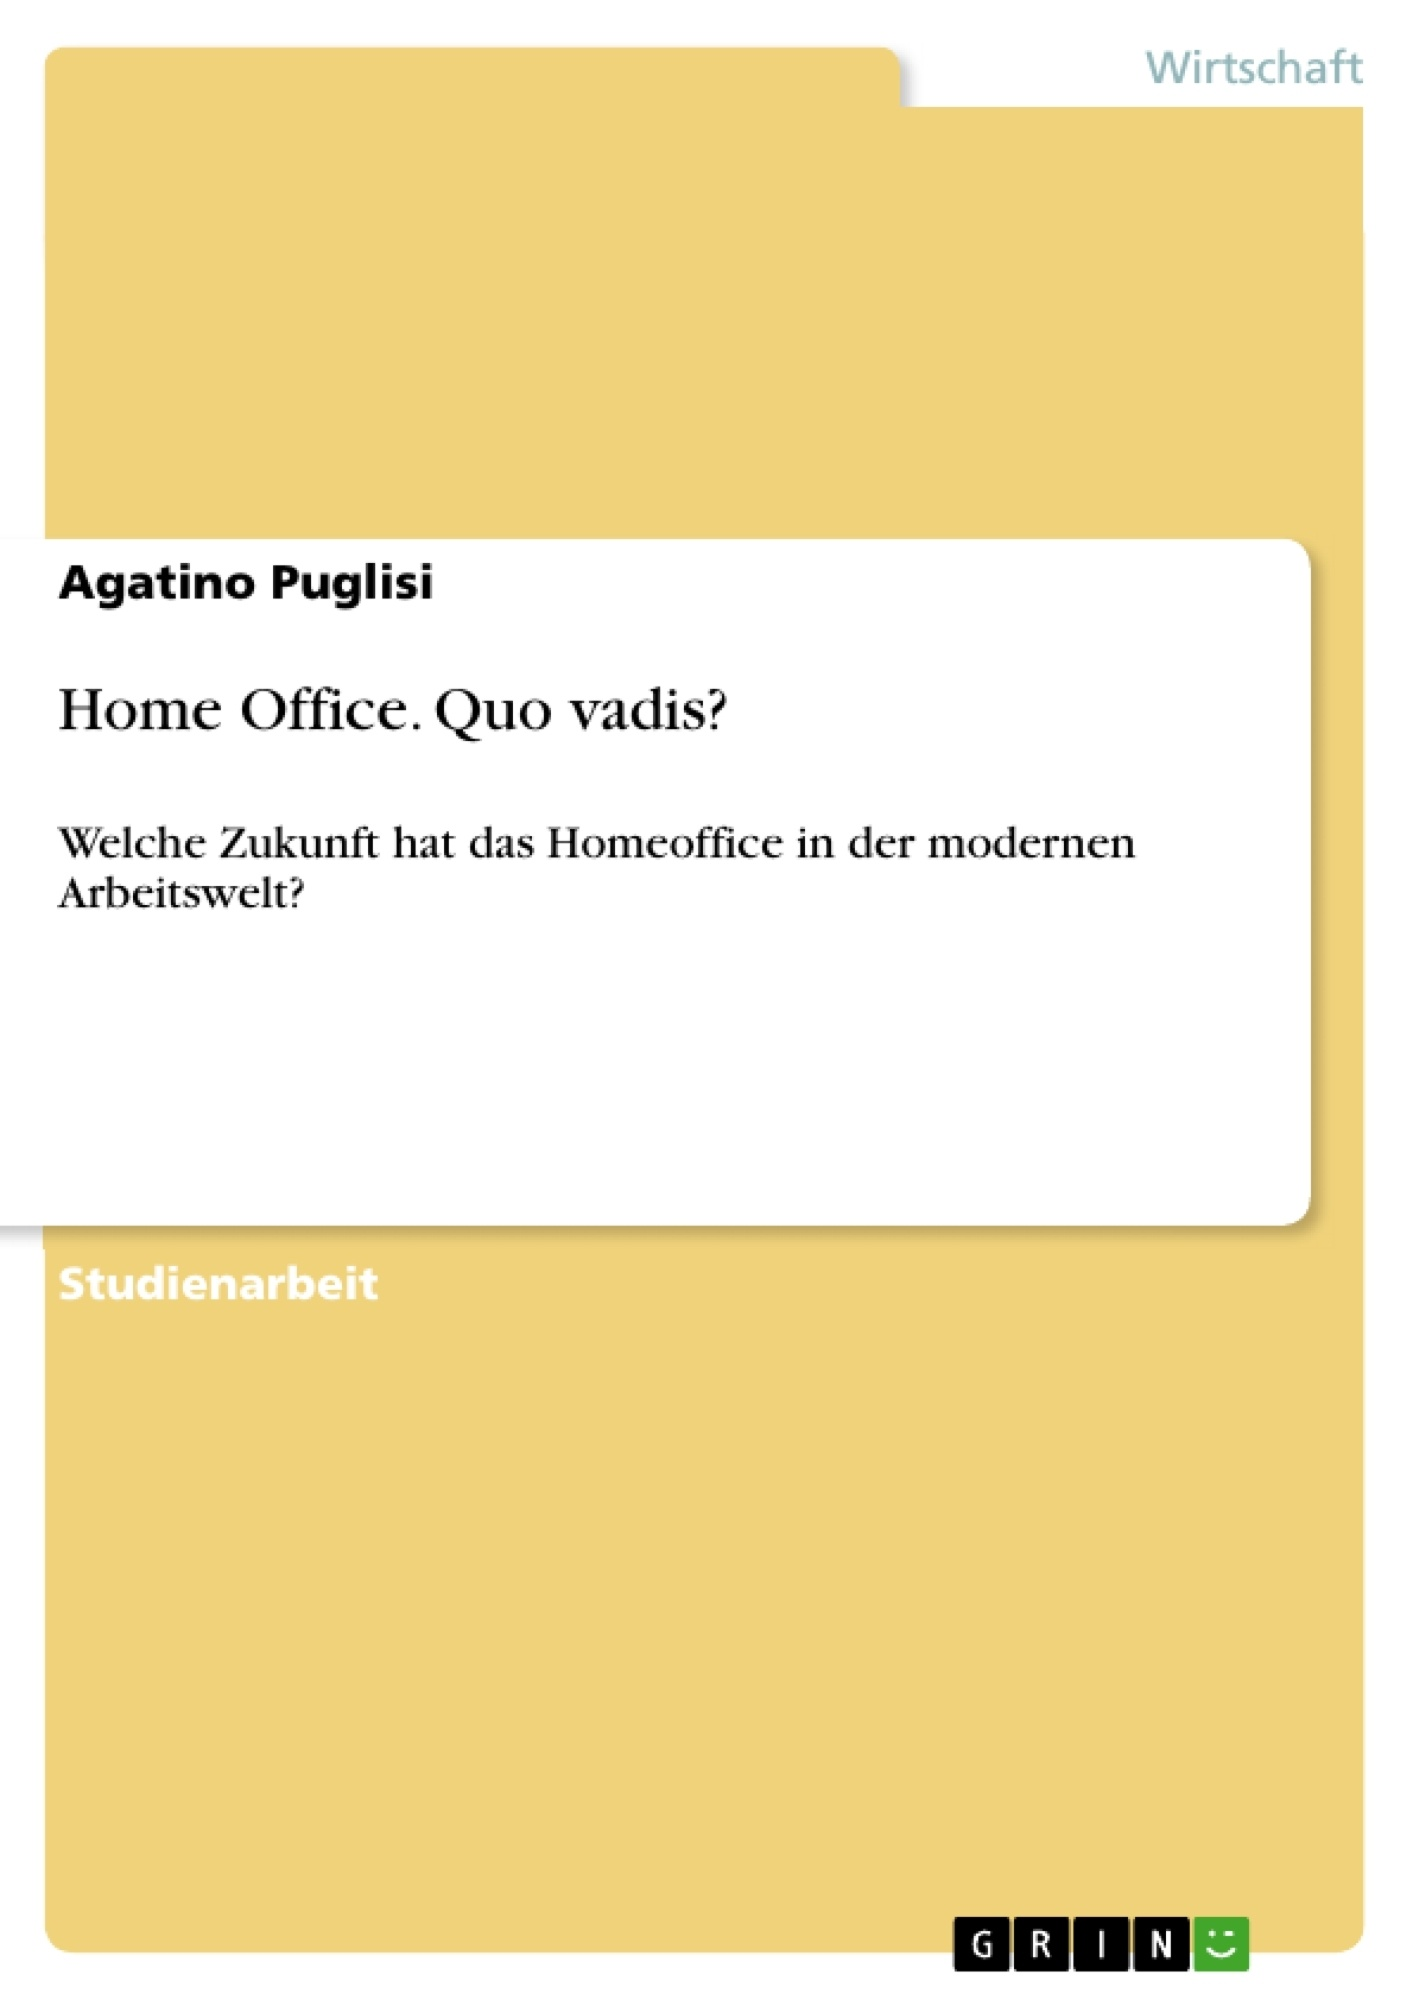 Titel: Home Office. Quo vadis?